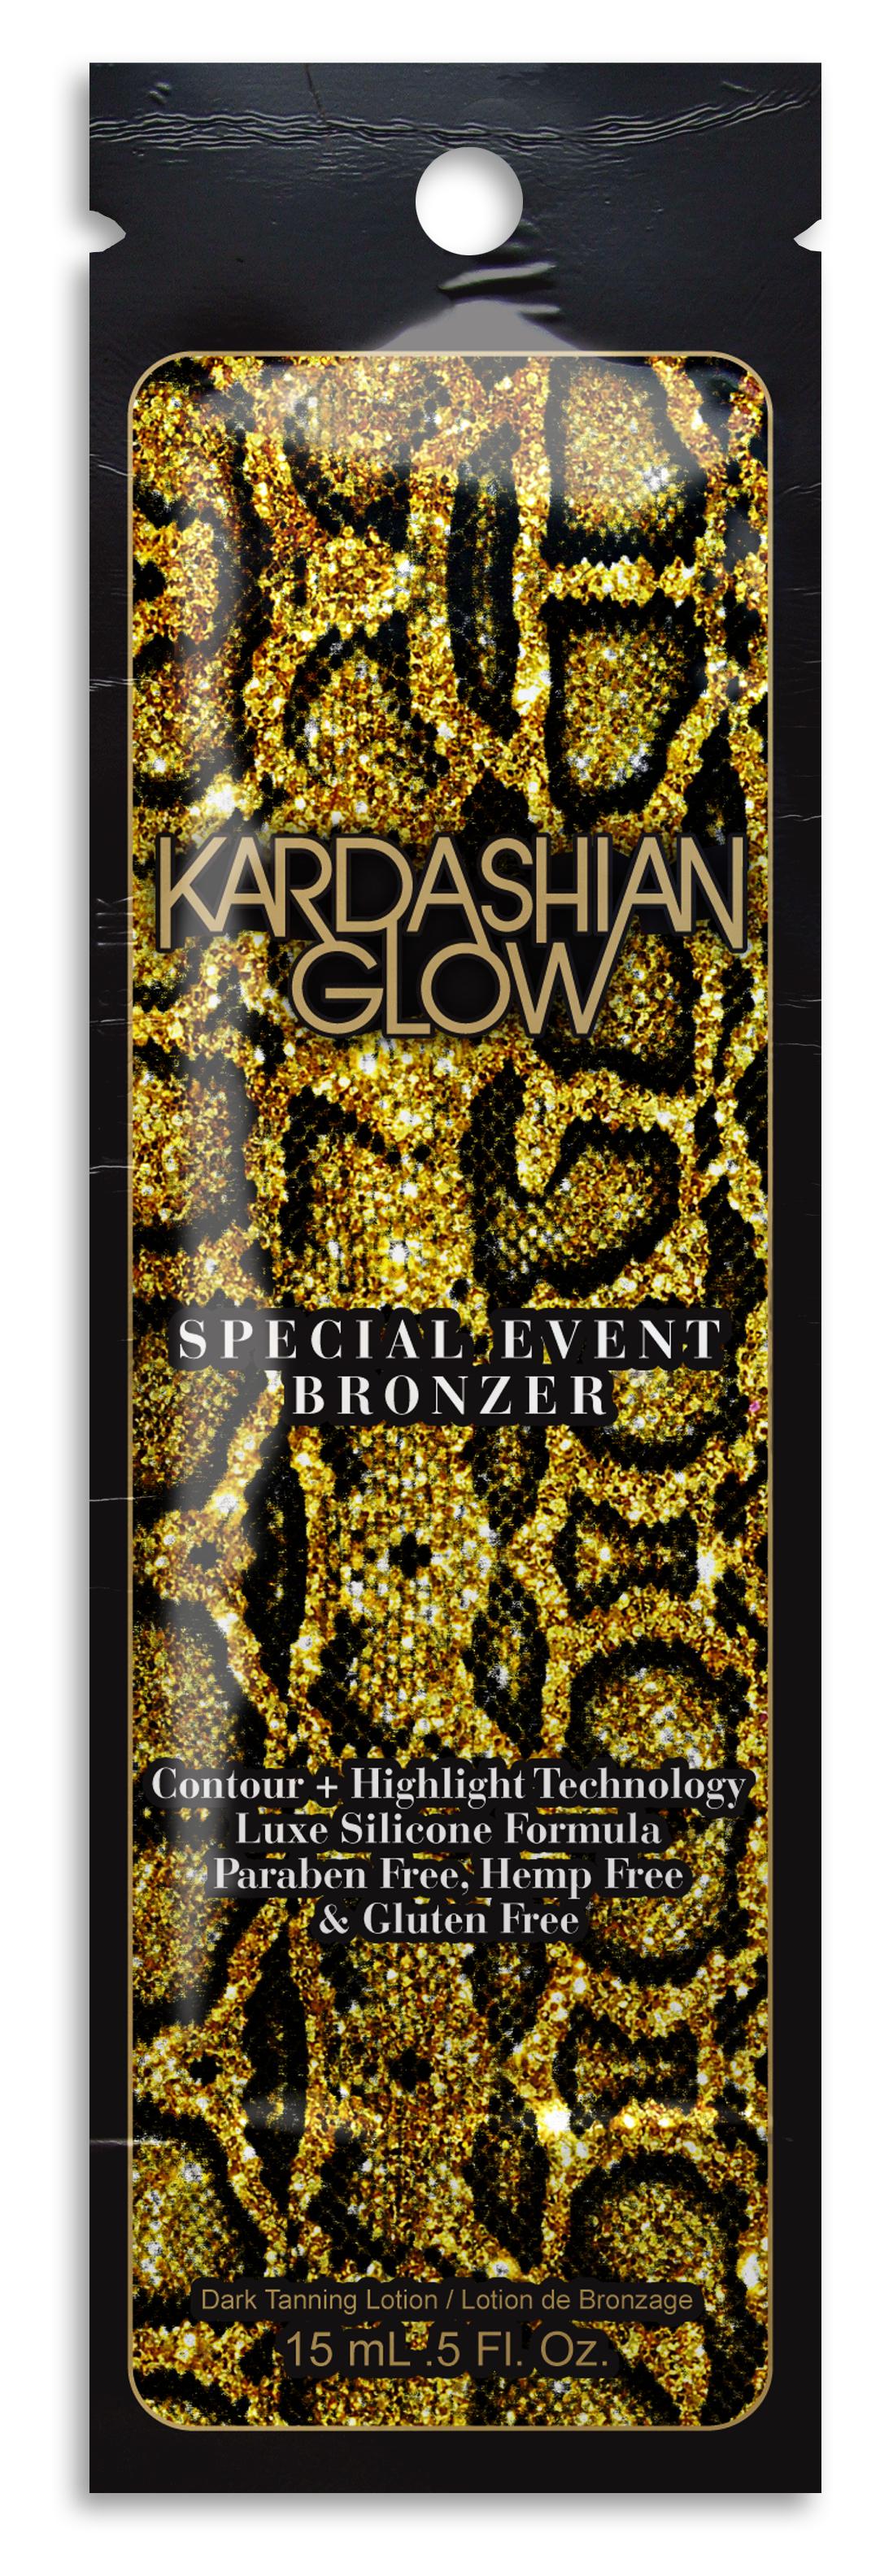 Kardashian Glow Special Event Bronzer Pkt